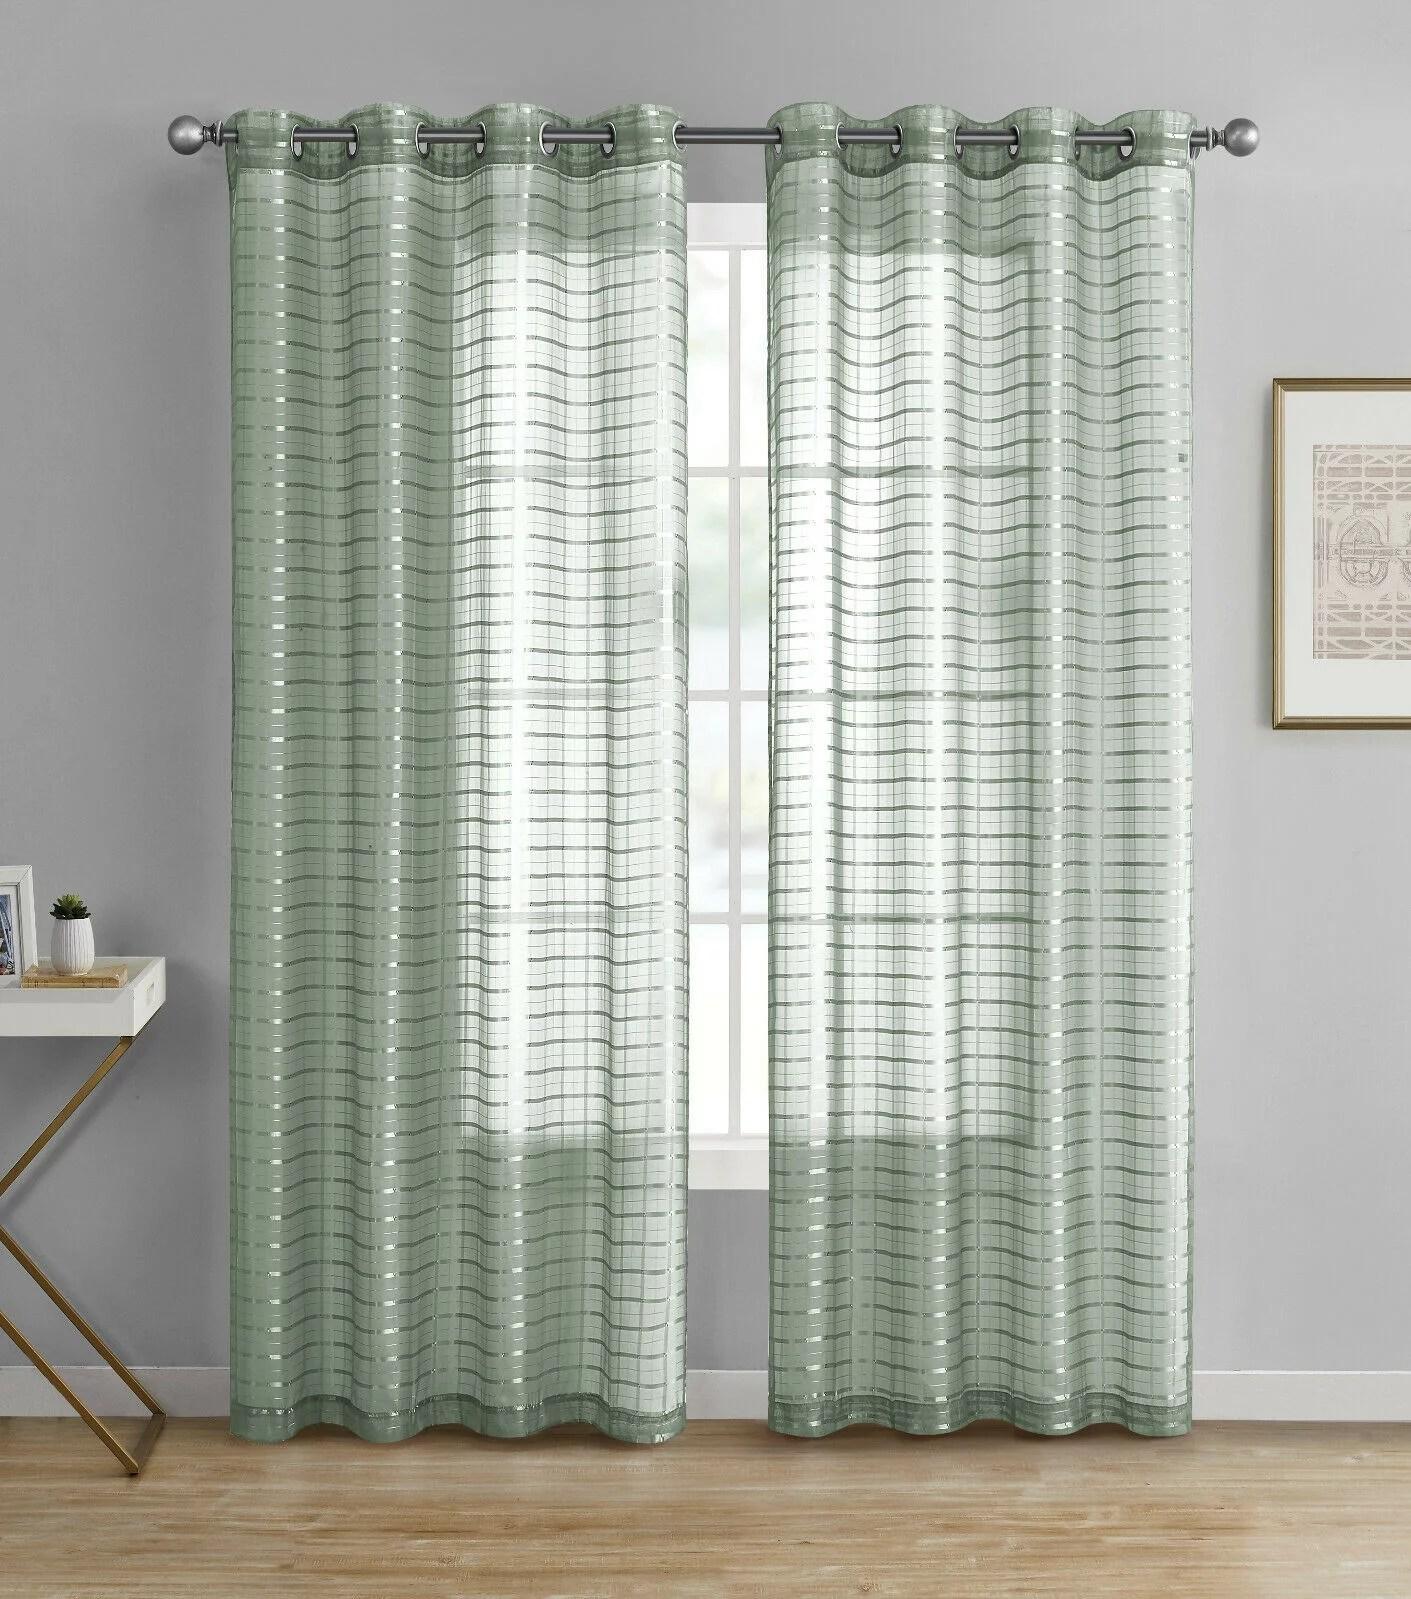 kate aurora living 2 pack semi sheer plaid grommet top window curtains sage green 84 in long walmart com